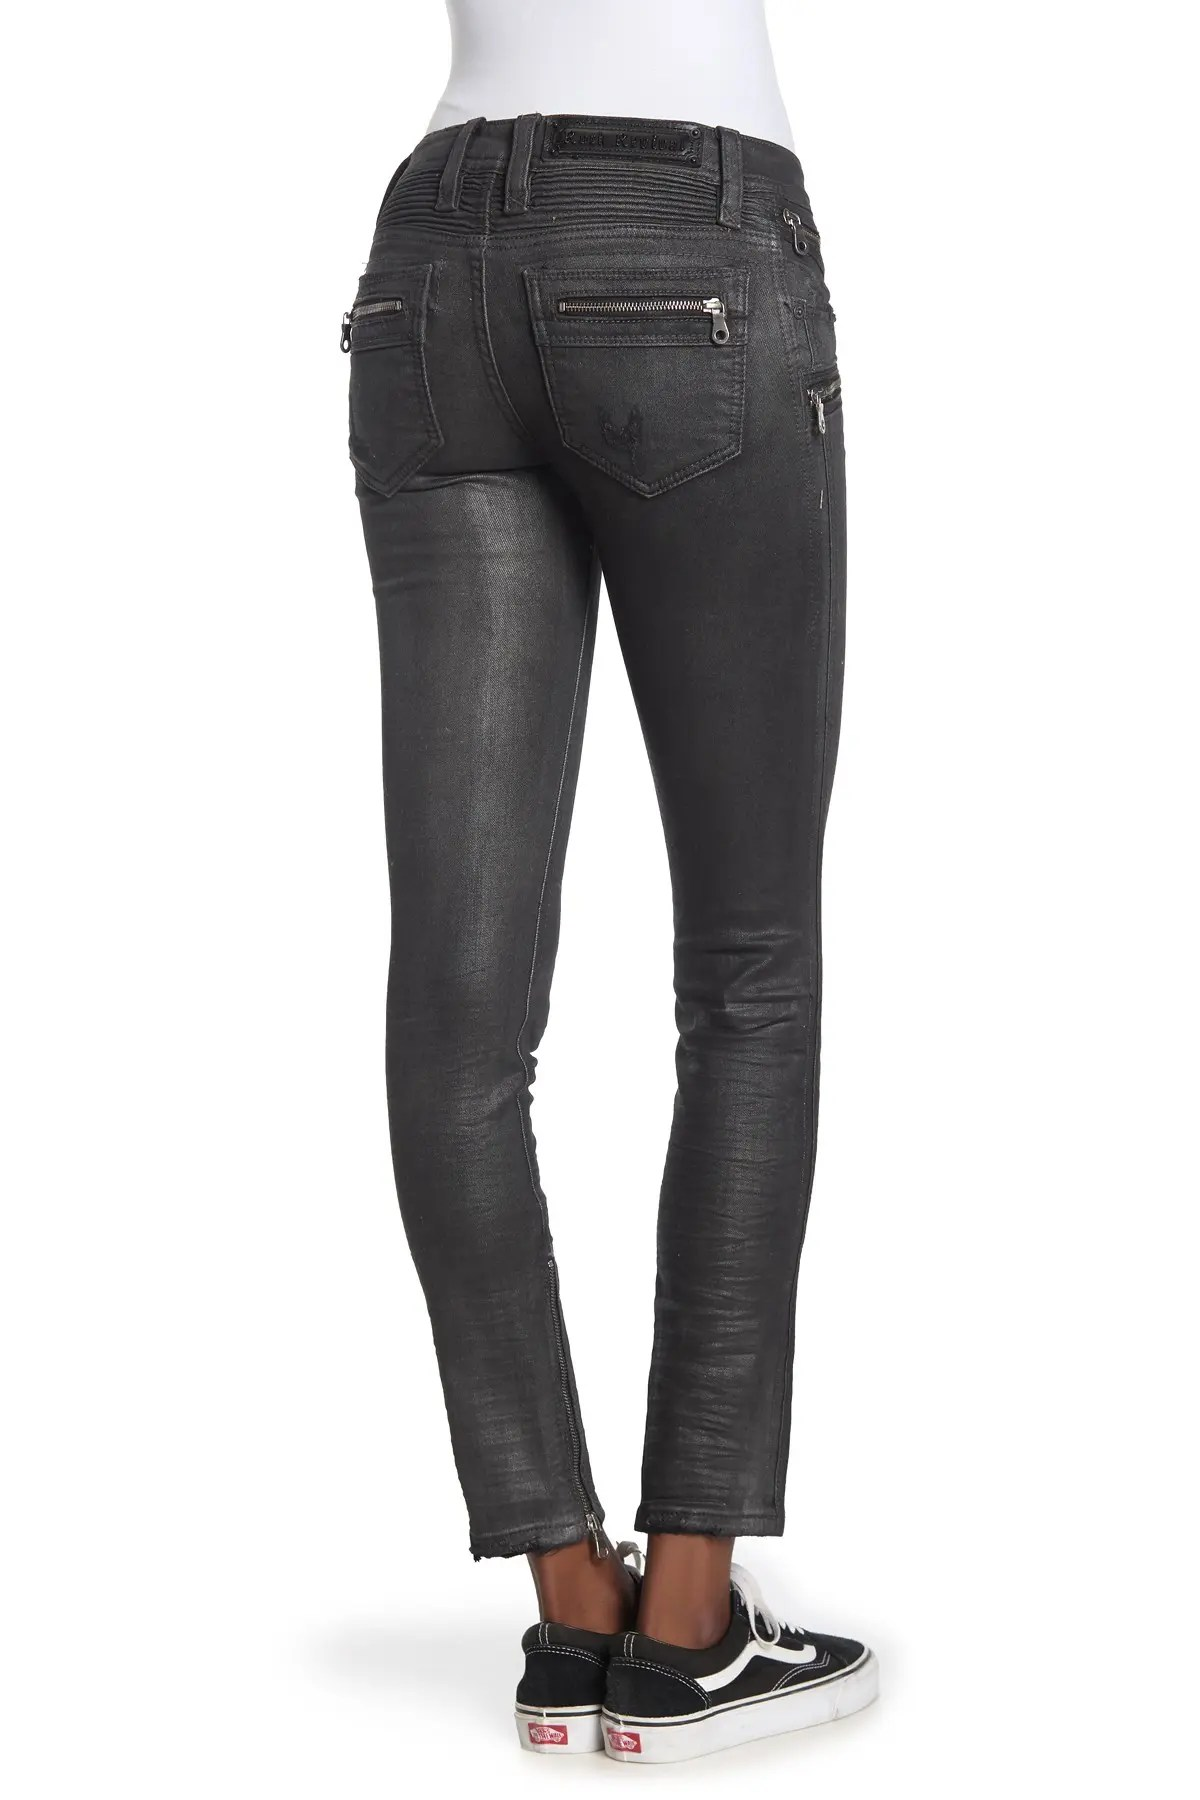 rock revival women s jeans denim